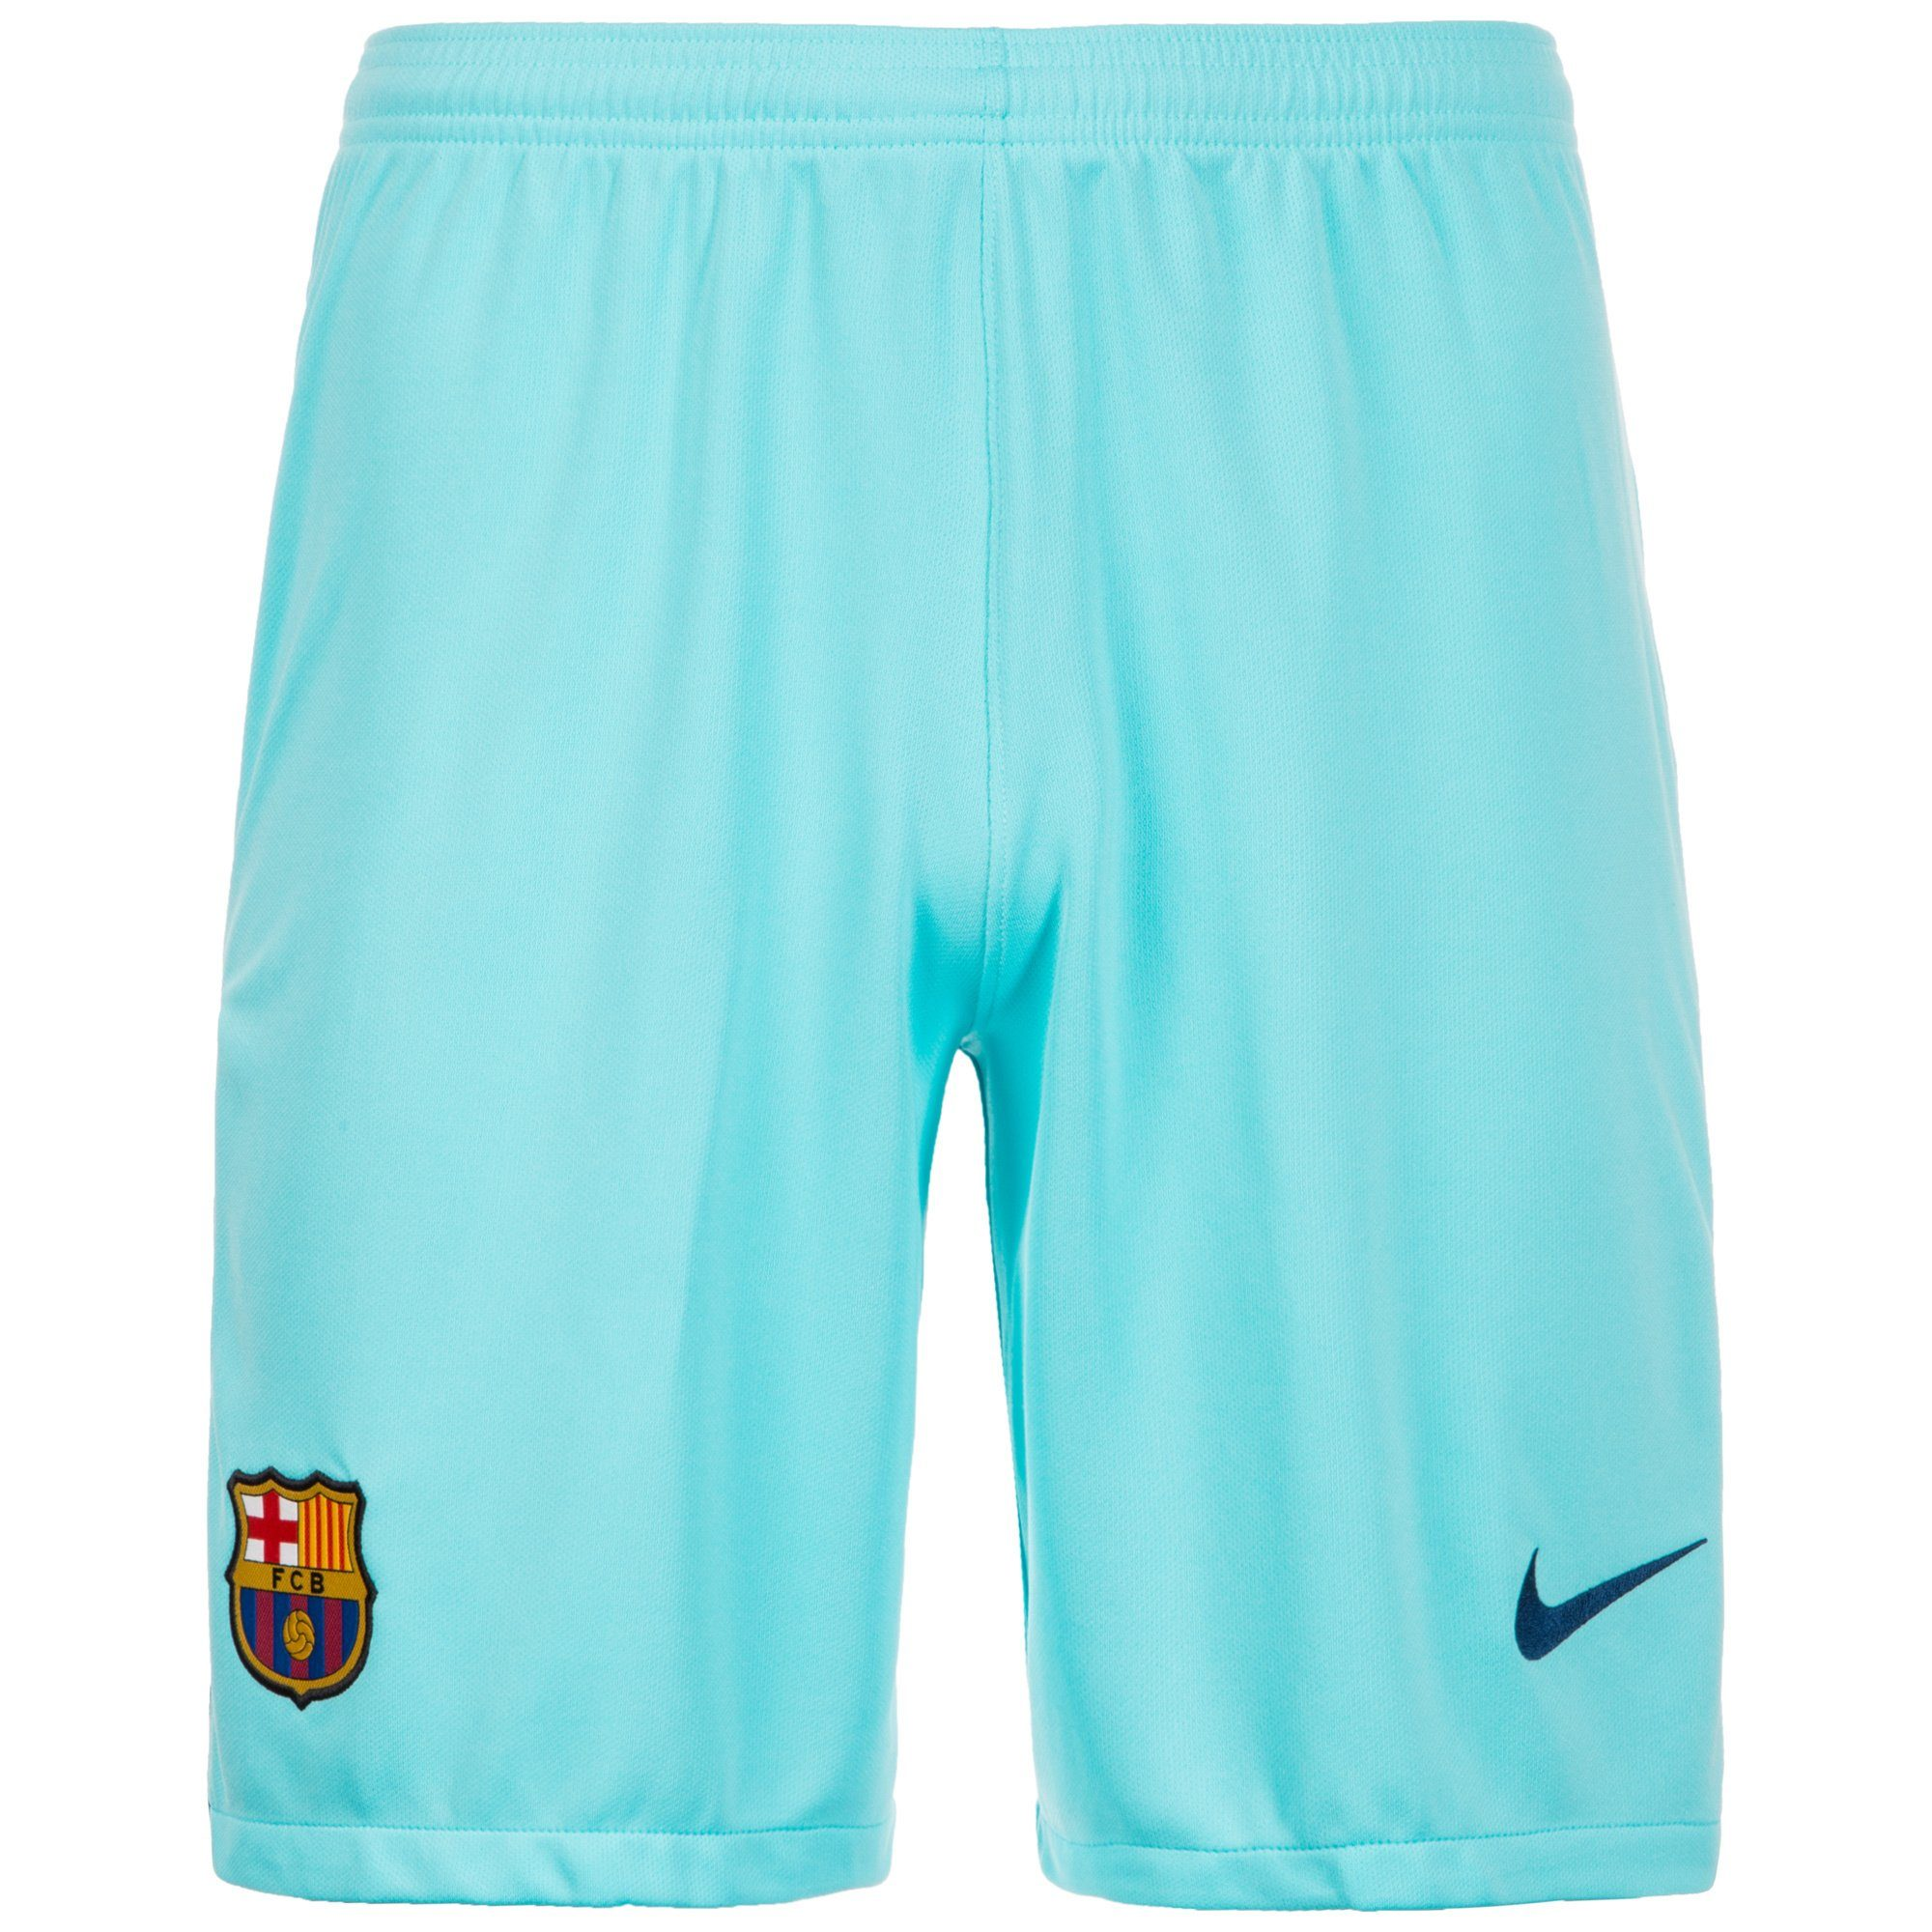 Nike Funktionsshorts »Fc Barcelona 17/18 Auswärts« | Bekleidung > Shorts & Bermudas > Shorts | Blau | Ab | NIKE